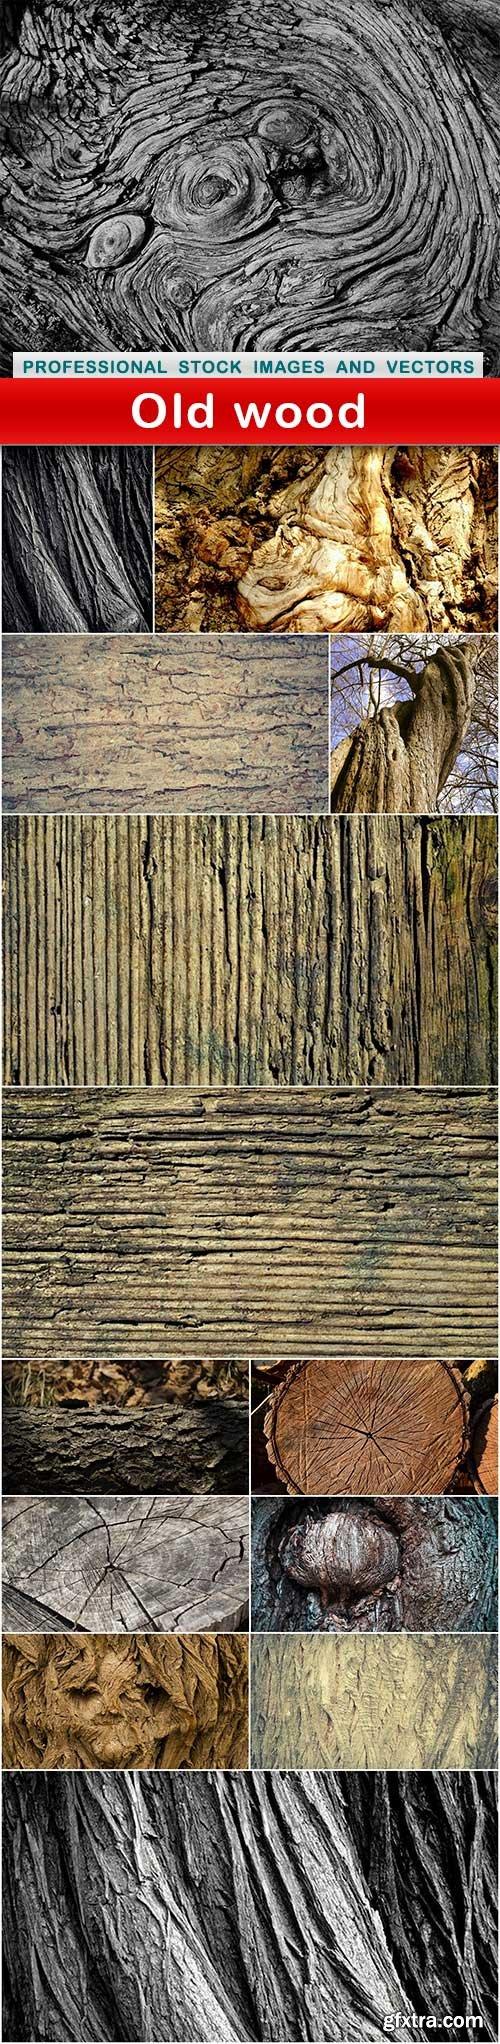 Old wood - 14 UHQ JPEG